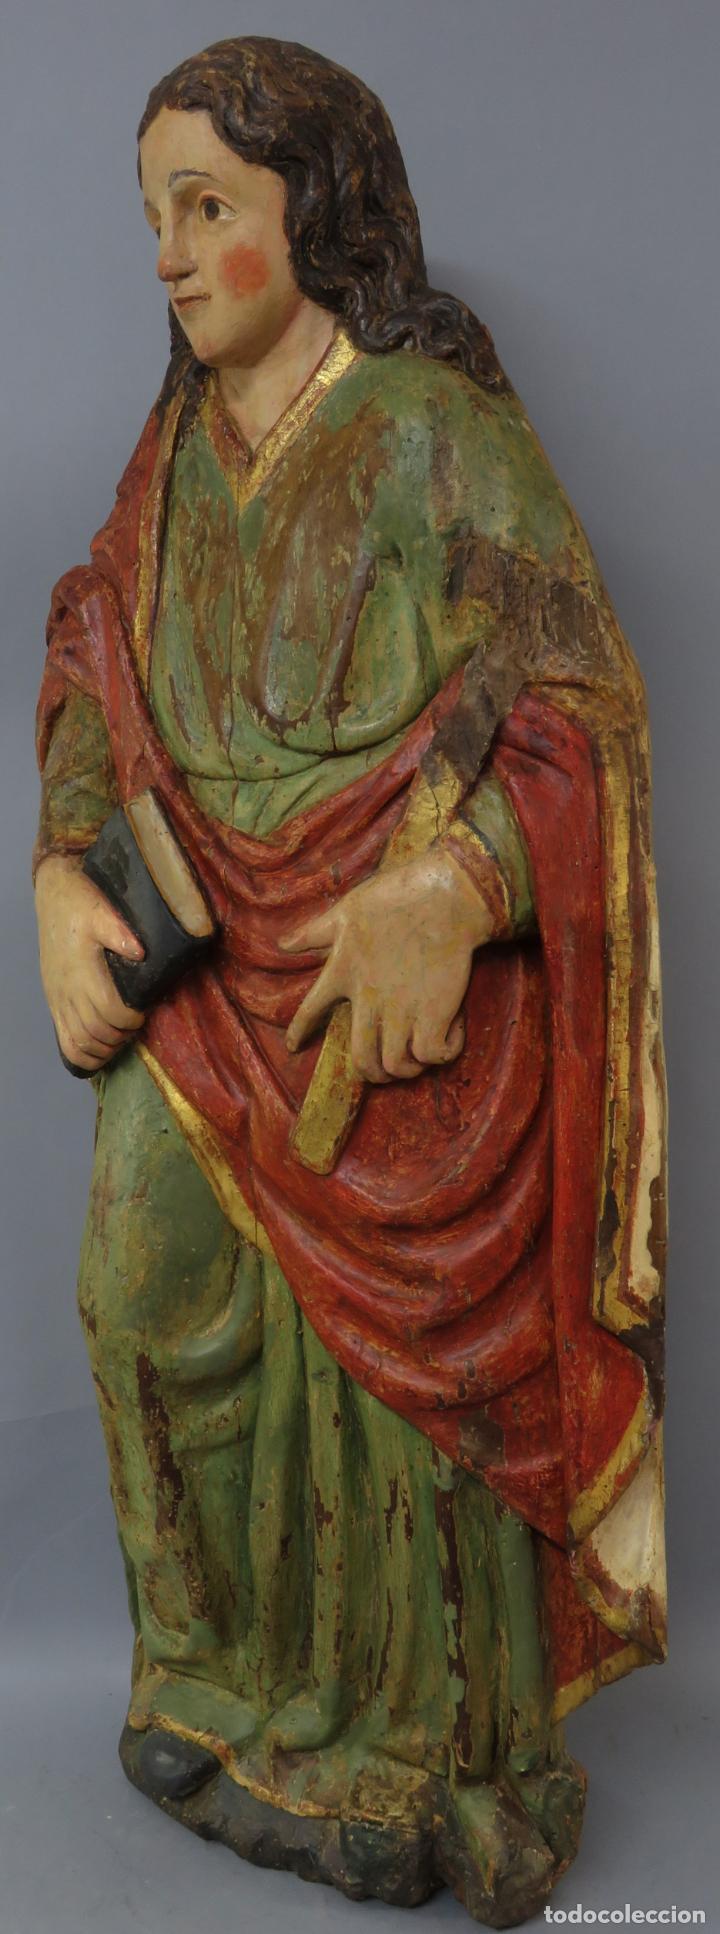 Arte: Talla de medio bulto o chuleta San Juan Evangelista madera tallada dorada y policromada XVI XVII - Foto 13 - 221922775